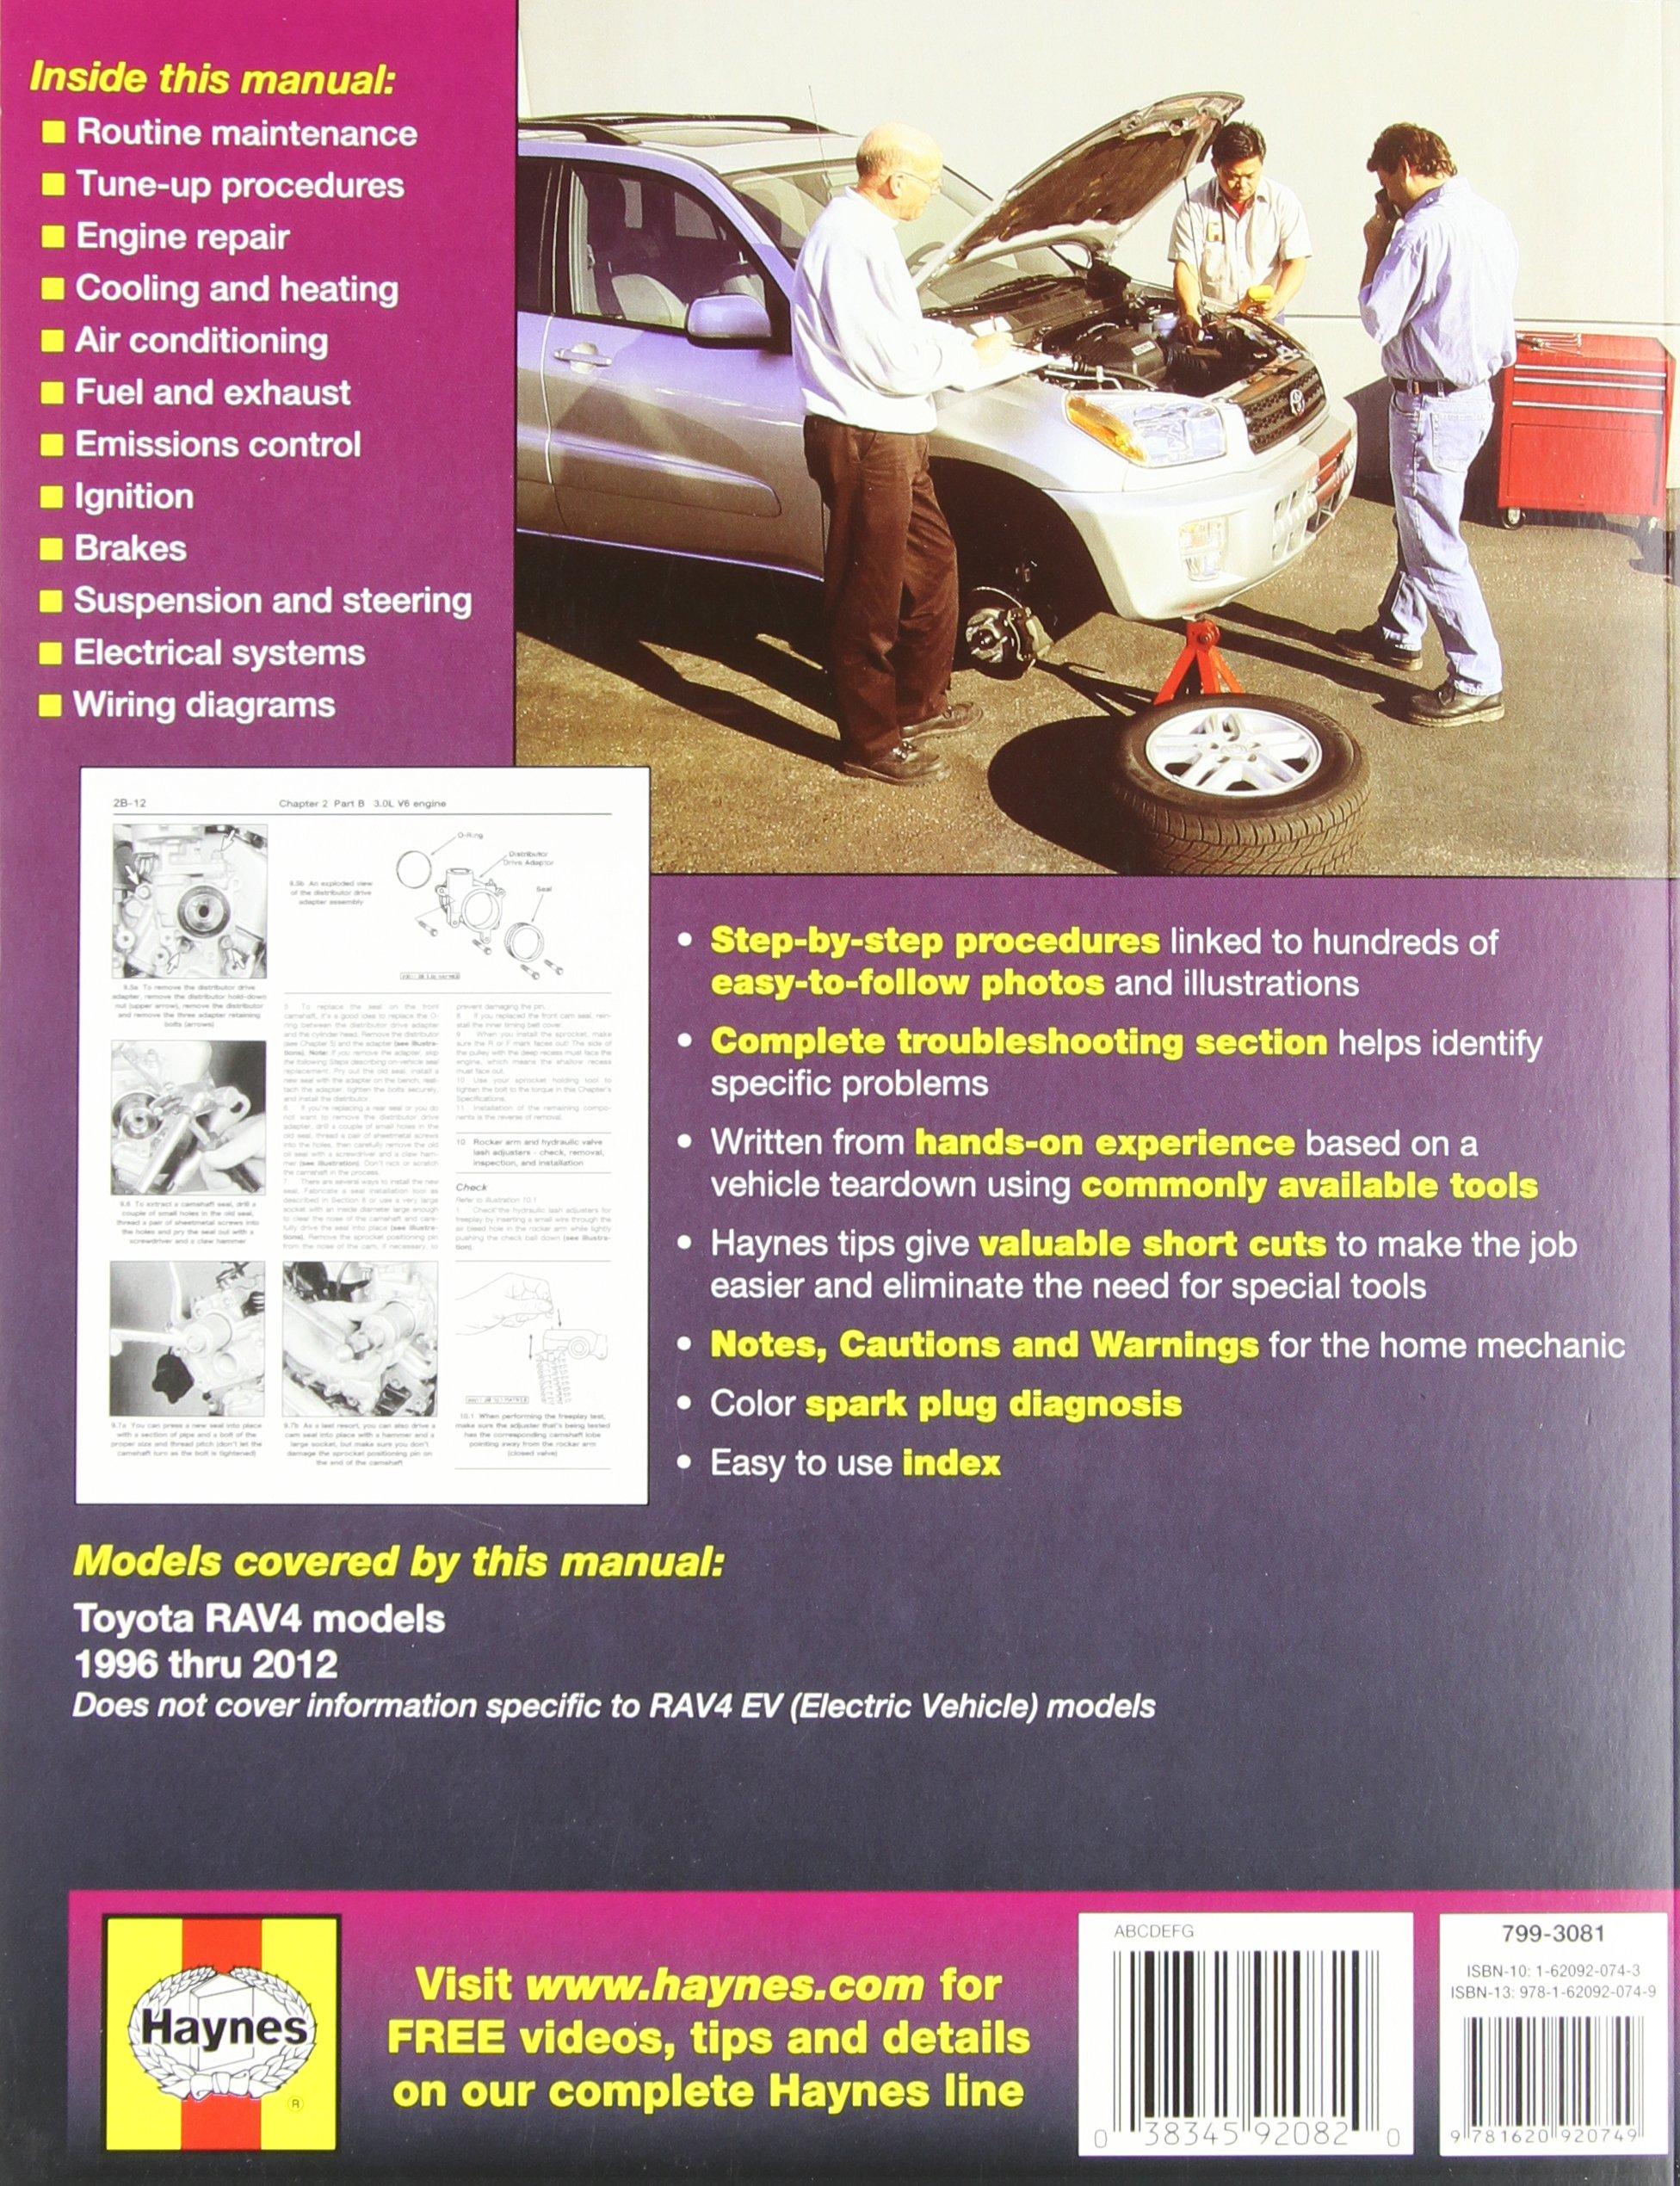 Toyota RAV4 Service Manual: Identification information